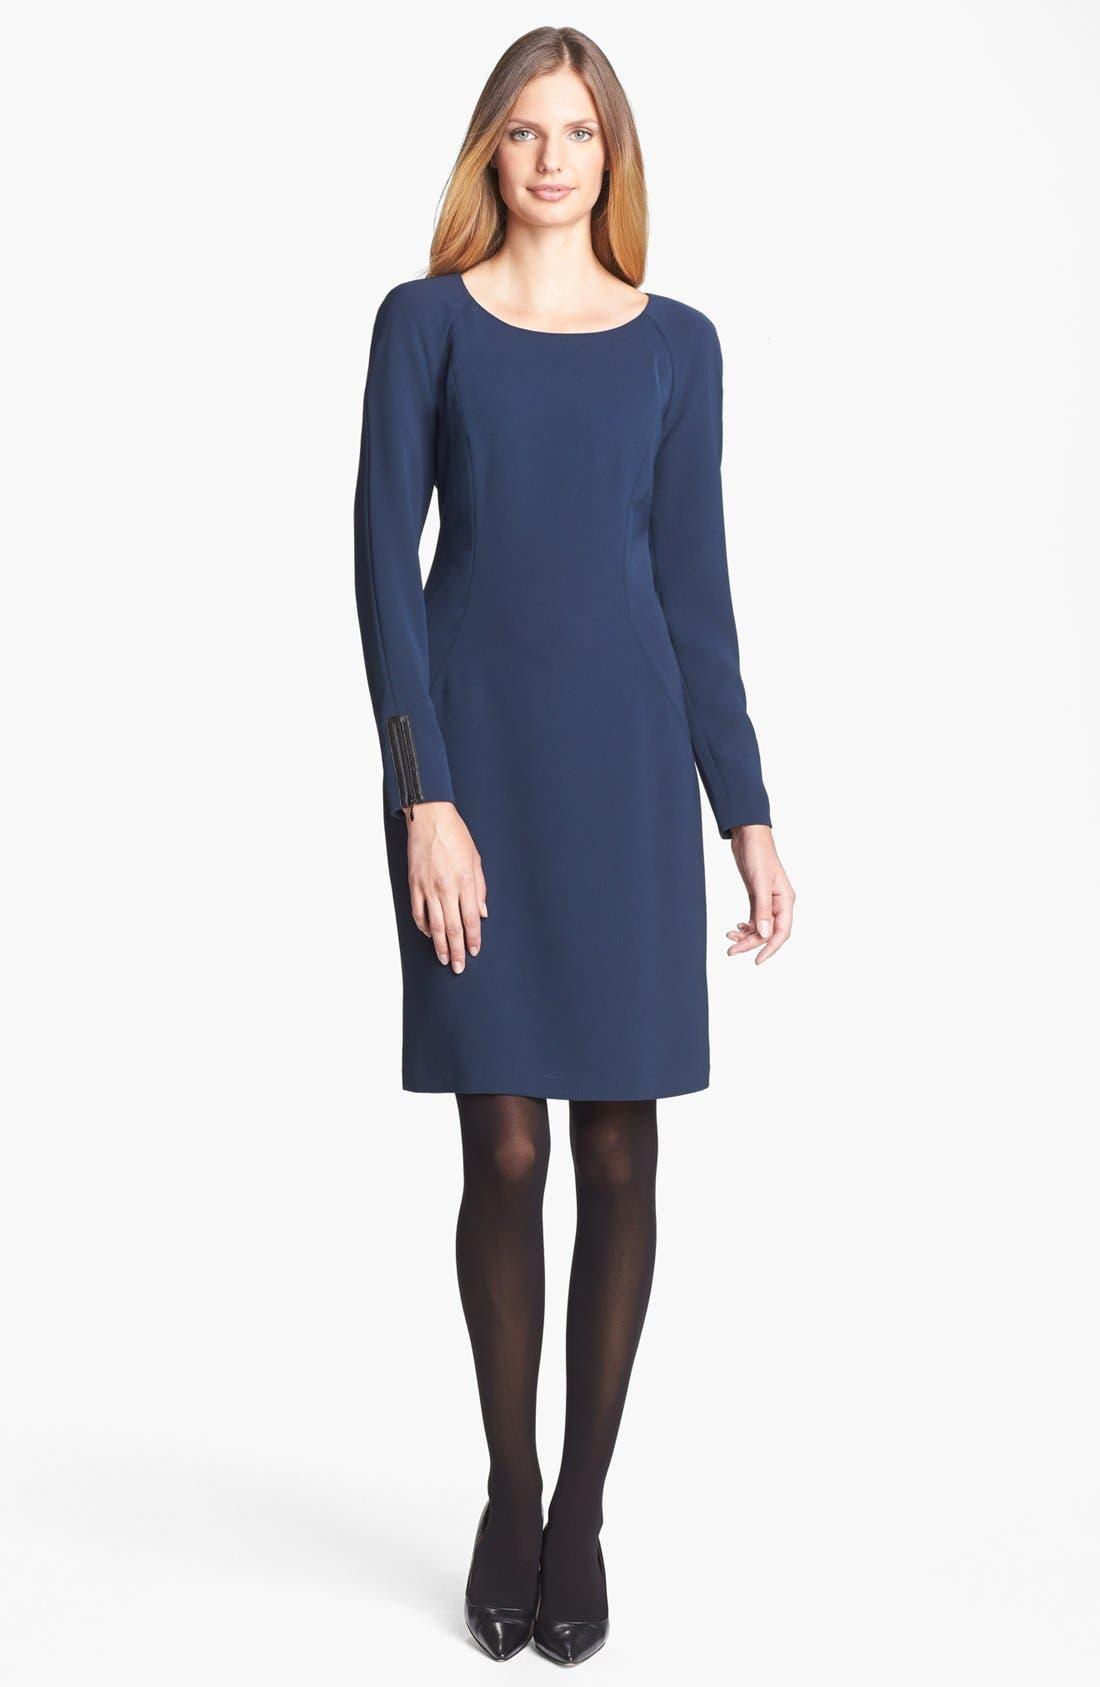 Main Image - Lafayette 148 New York 'Lucida' Dress